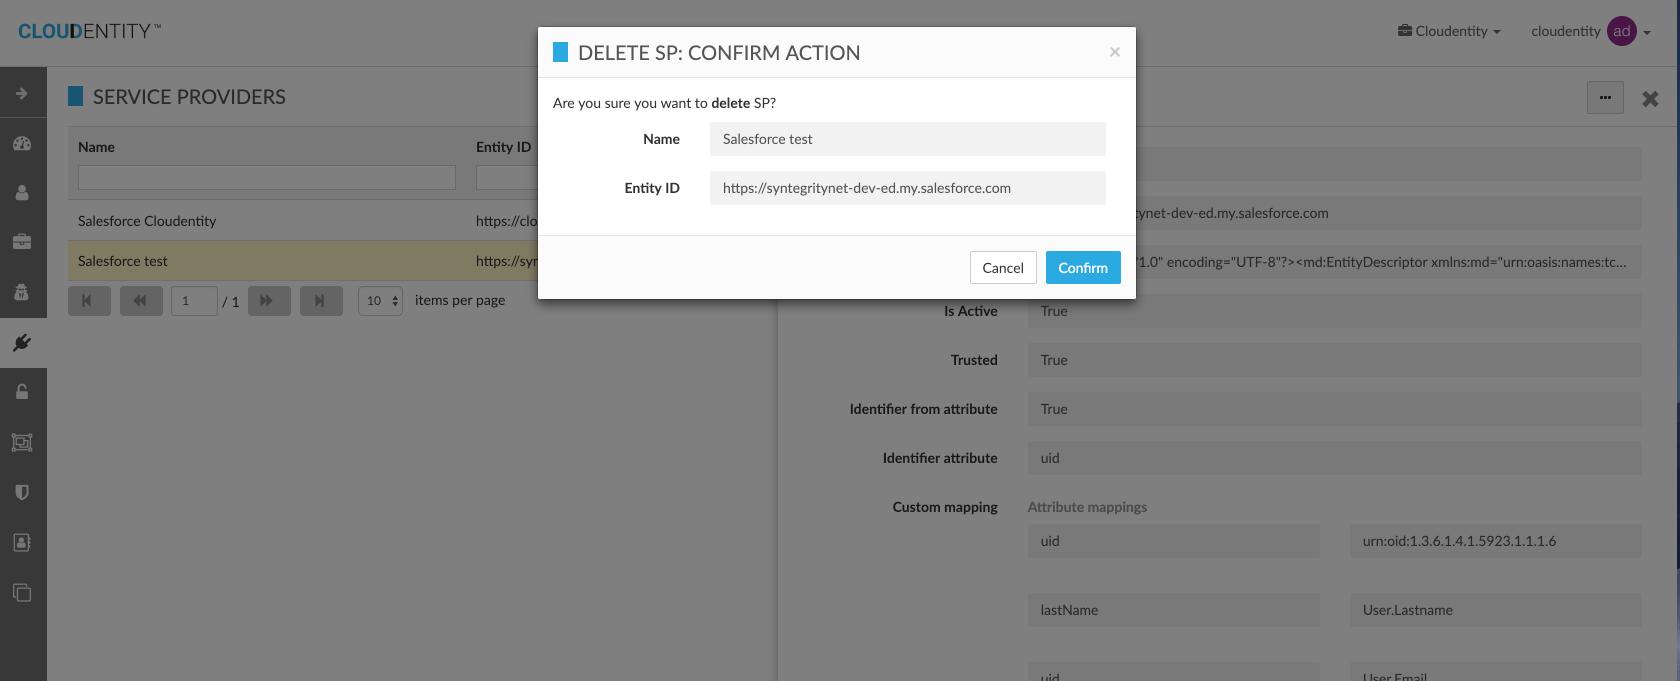 Delete External IDP Configuration for Organization